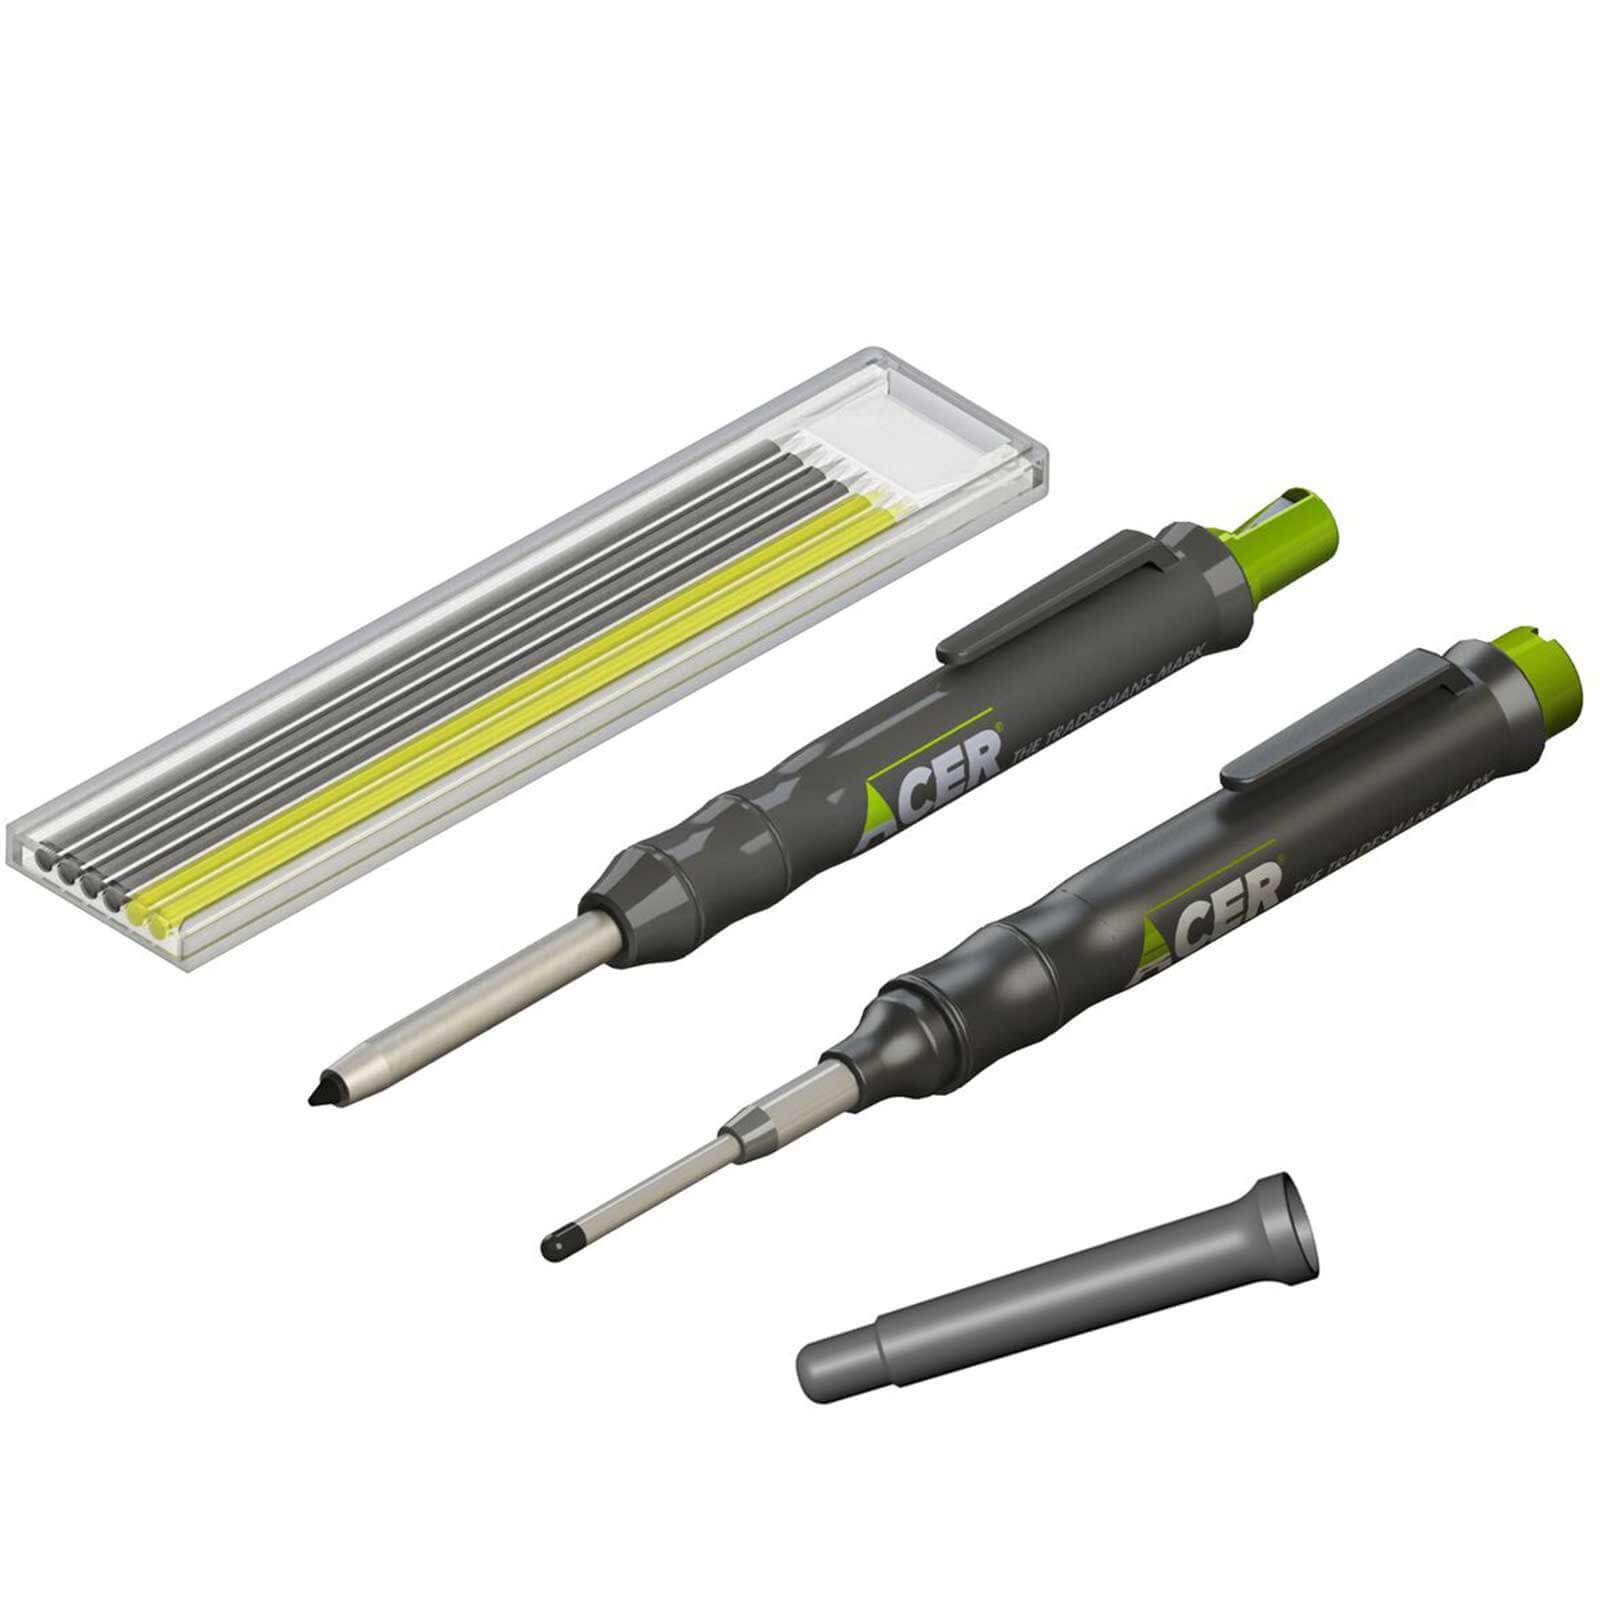 Image of Acer Marking Kit - Deep Hole Marker Pen, Pencil & Lead Set